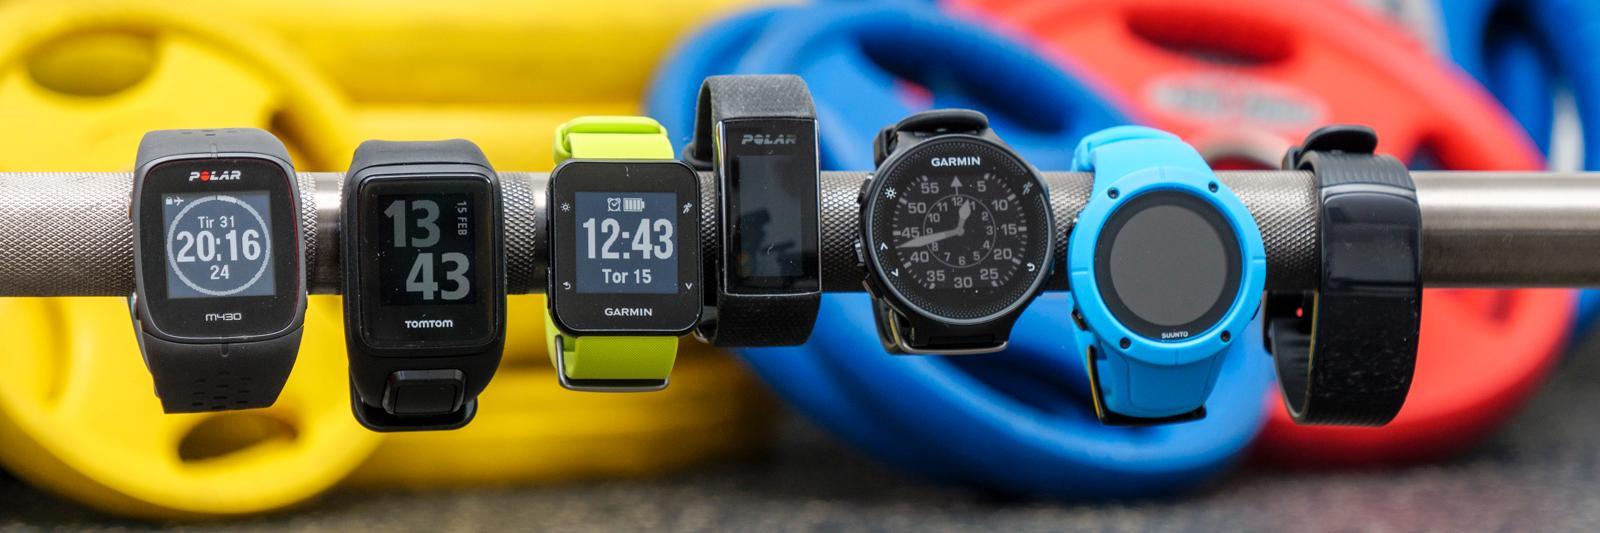 Fra venstre: Polar M430, TomTom Spark 3 Cardio, Garmin Forerunner 35, Polar A370, Garmin Forerunner 235, Suunto Spartan Trainer Wrist HR, Samsung Gear Fit 2 Pro